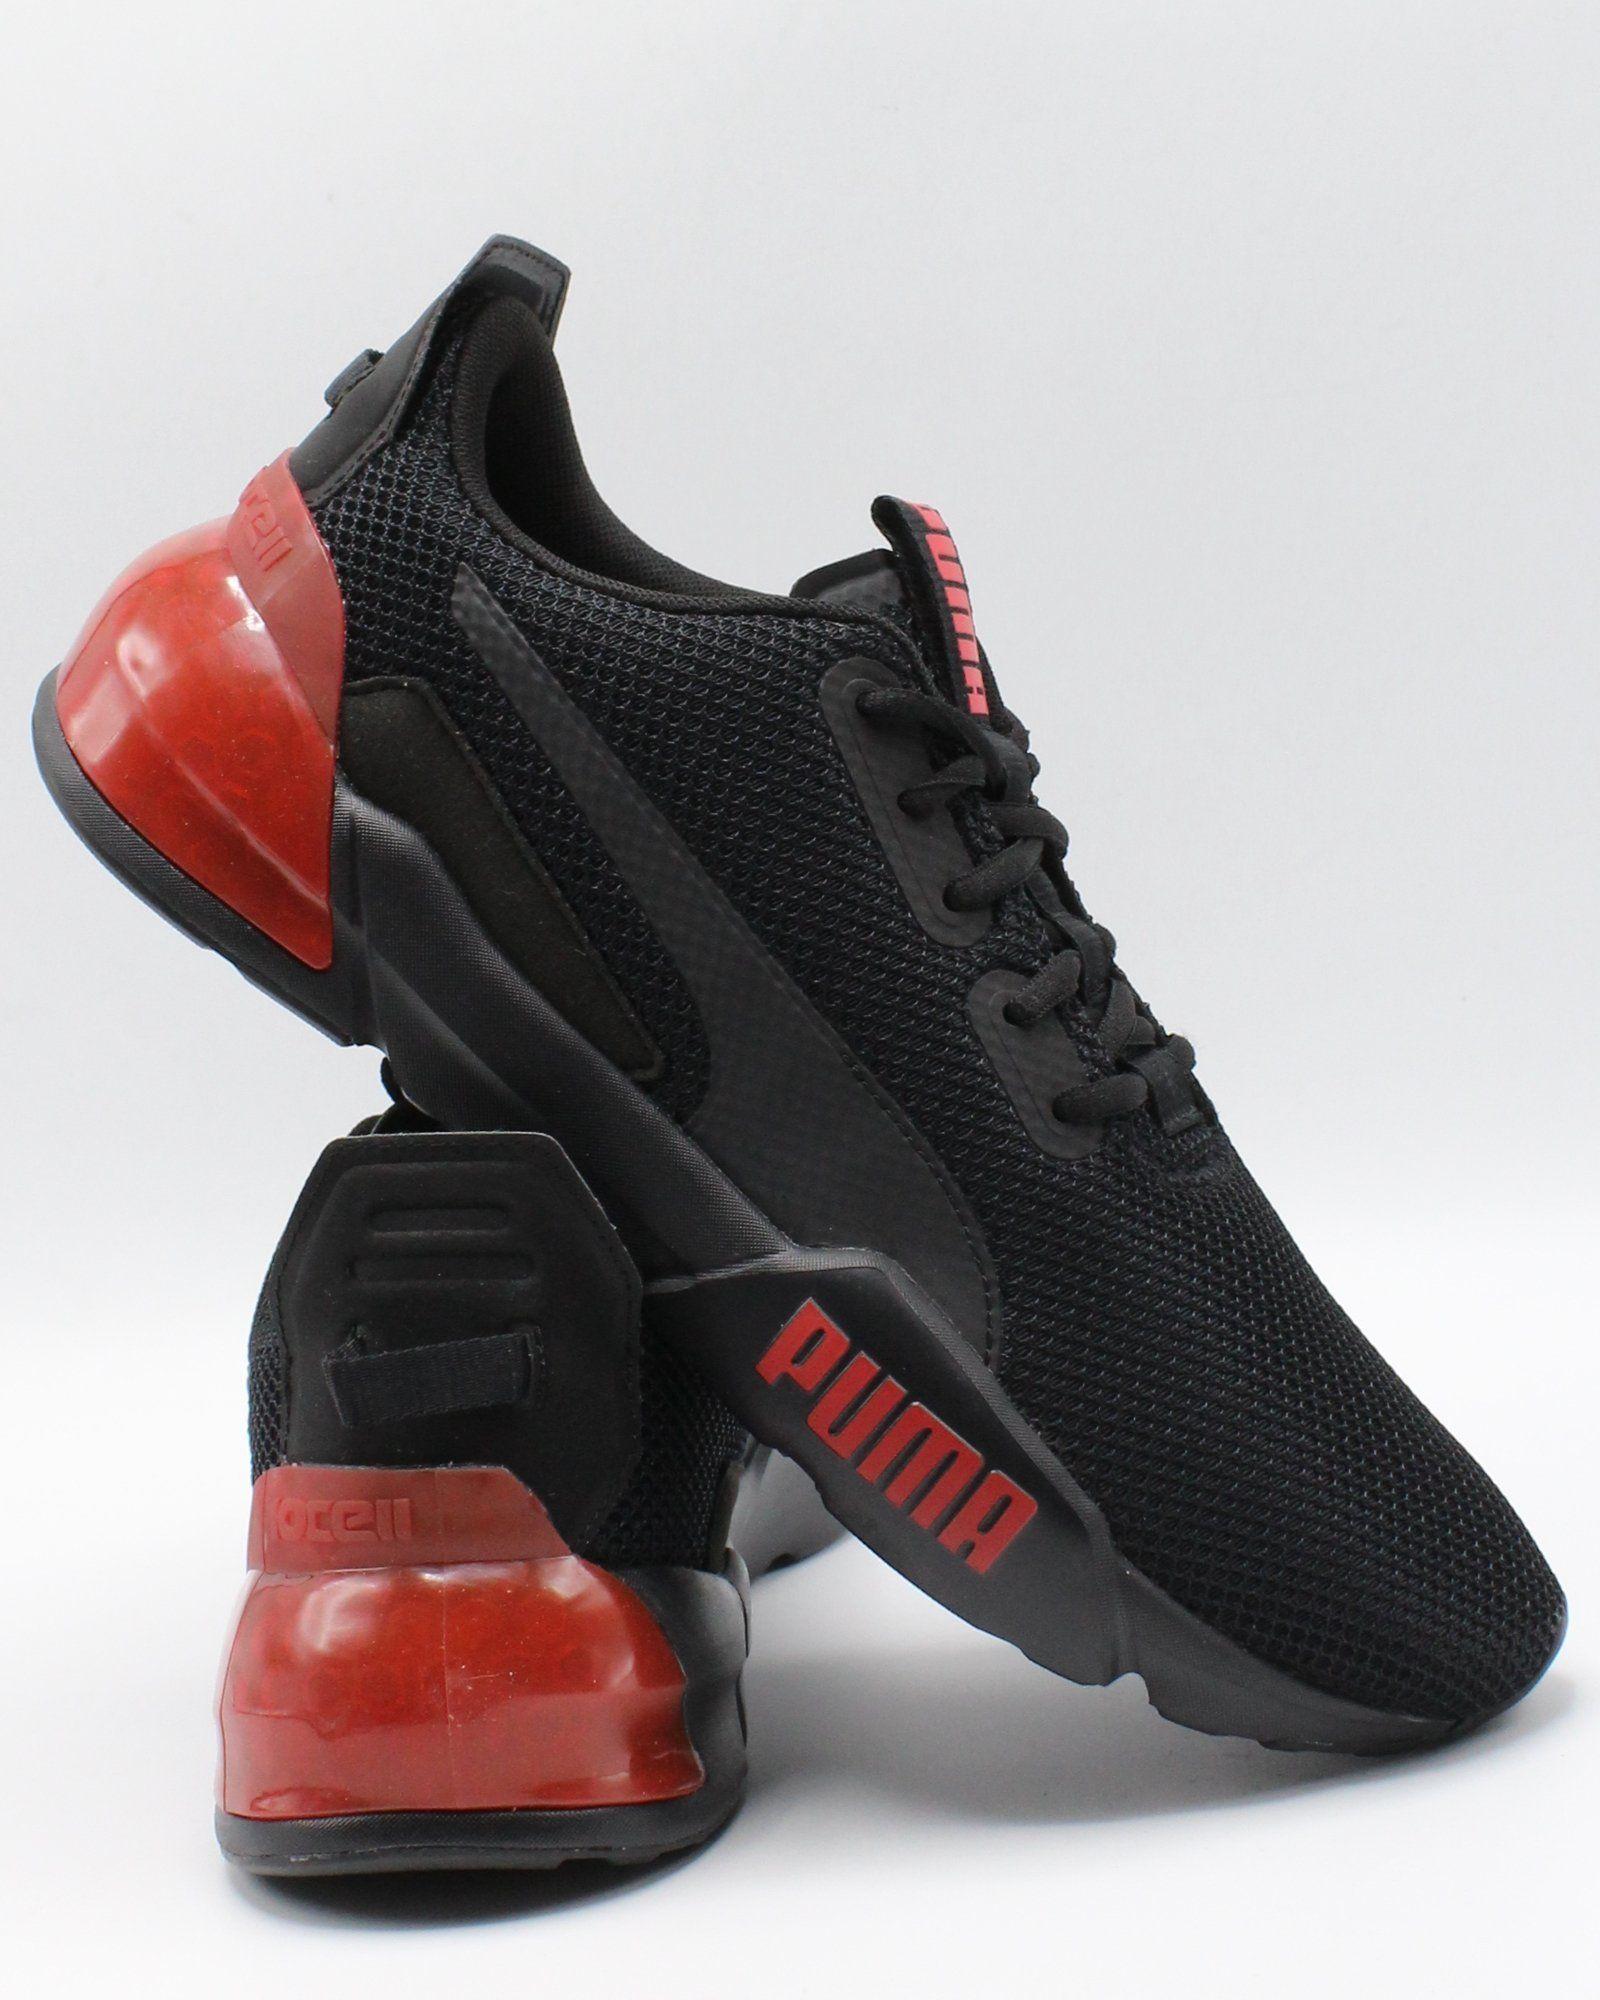 Men's FILA Mens Disruptor Ii Lab Sneaker Navy Red White VIM